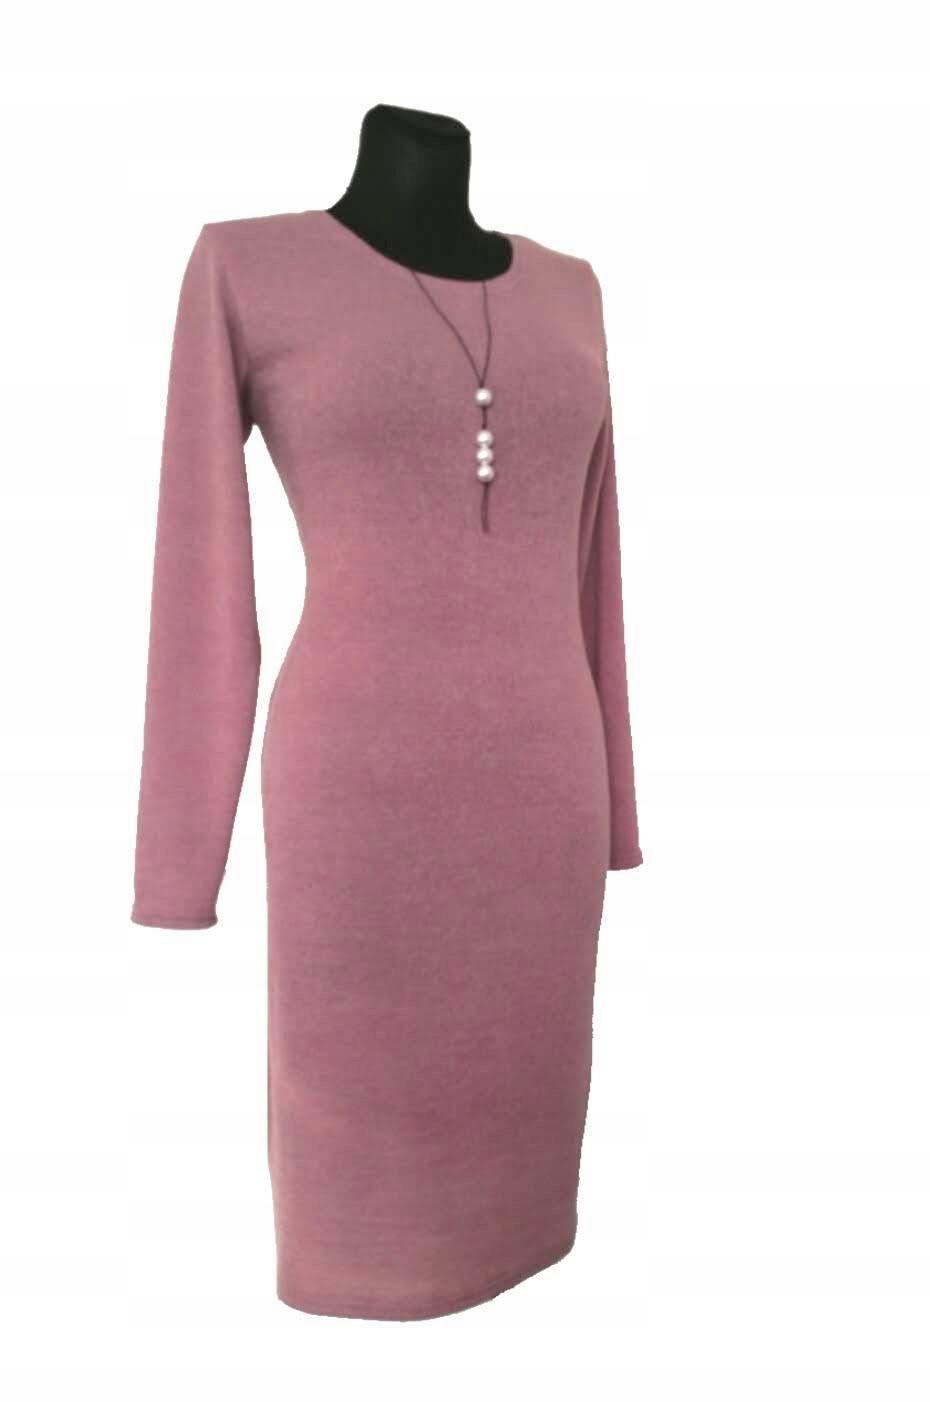 fbf9c86c74 Piękna sukienka rozm. (42-54) TU rozmiar 48 GRATIS - 7697670198 ...